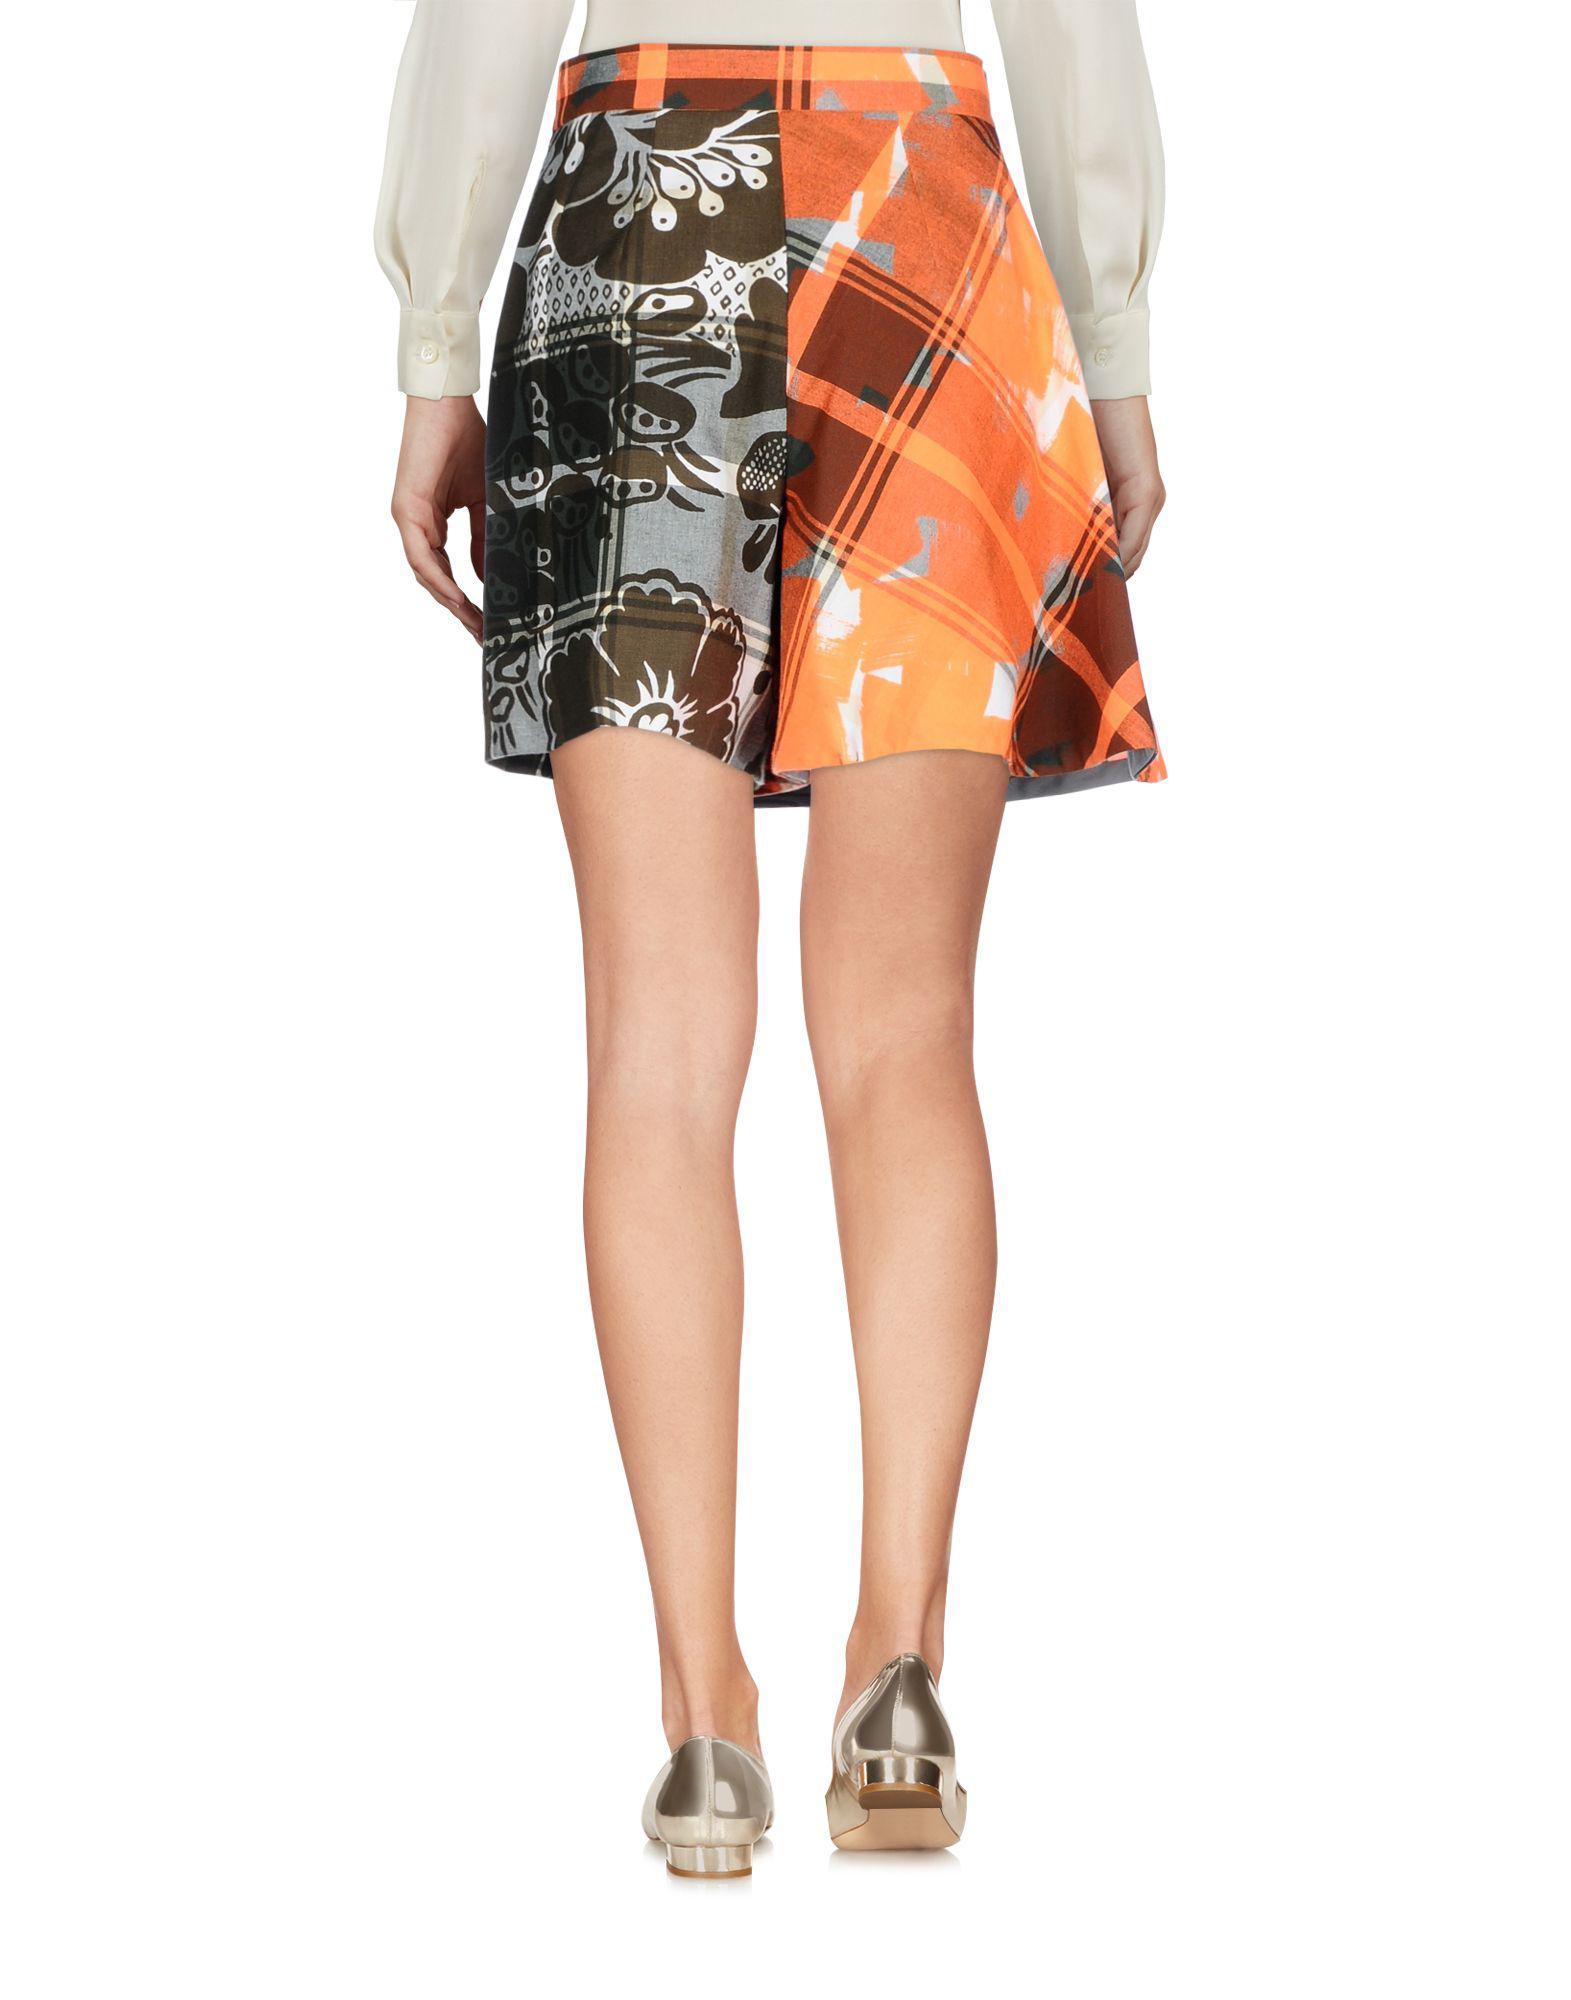 a333aa6c7a Vivienne Westwood Mini Skirt in Orange - Lyst